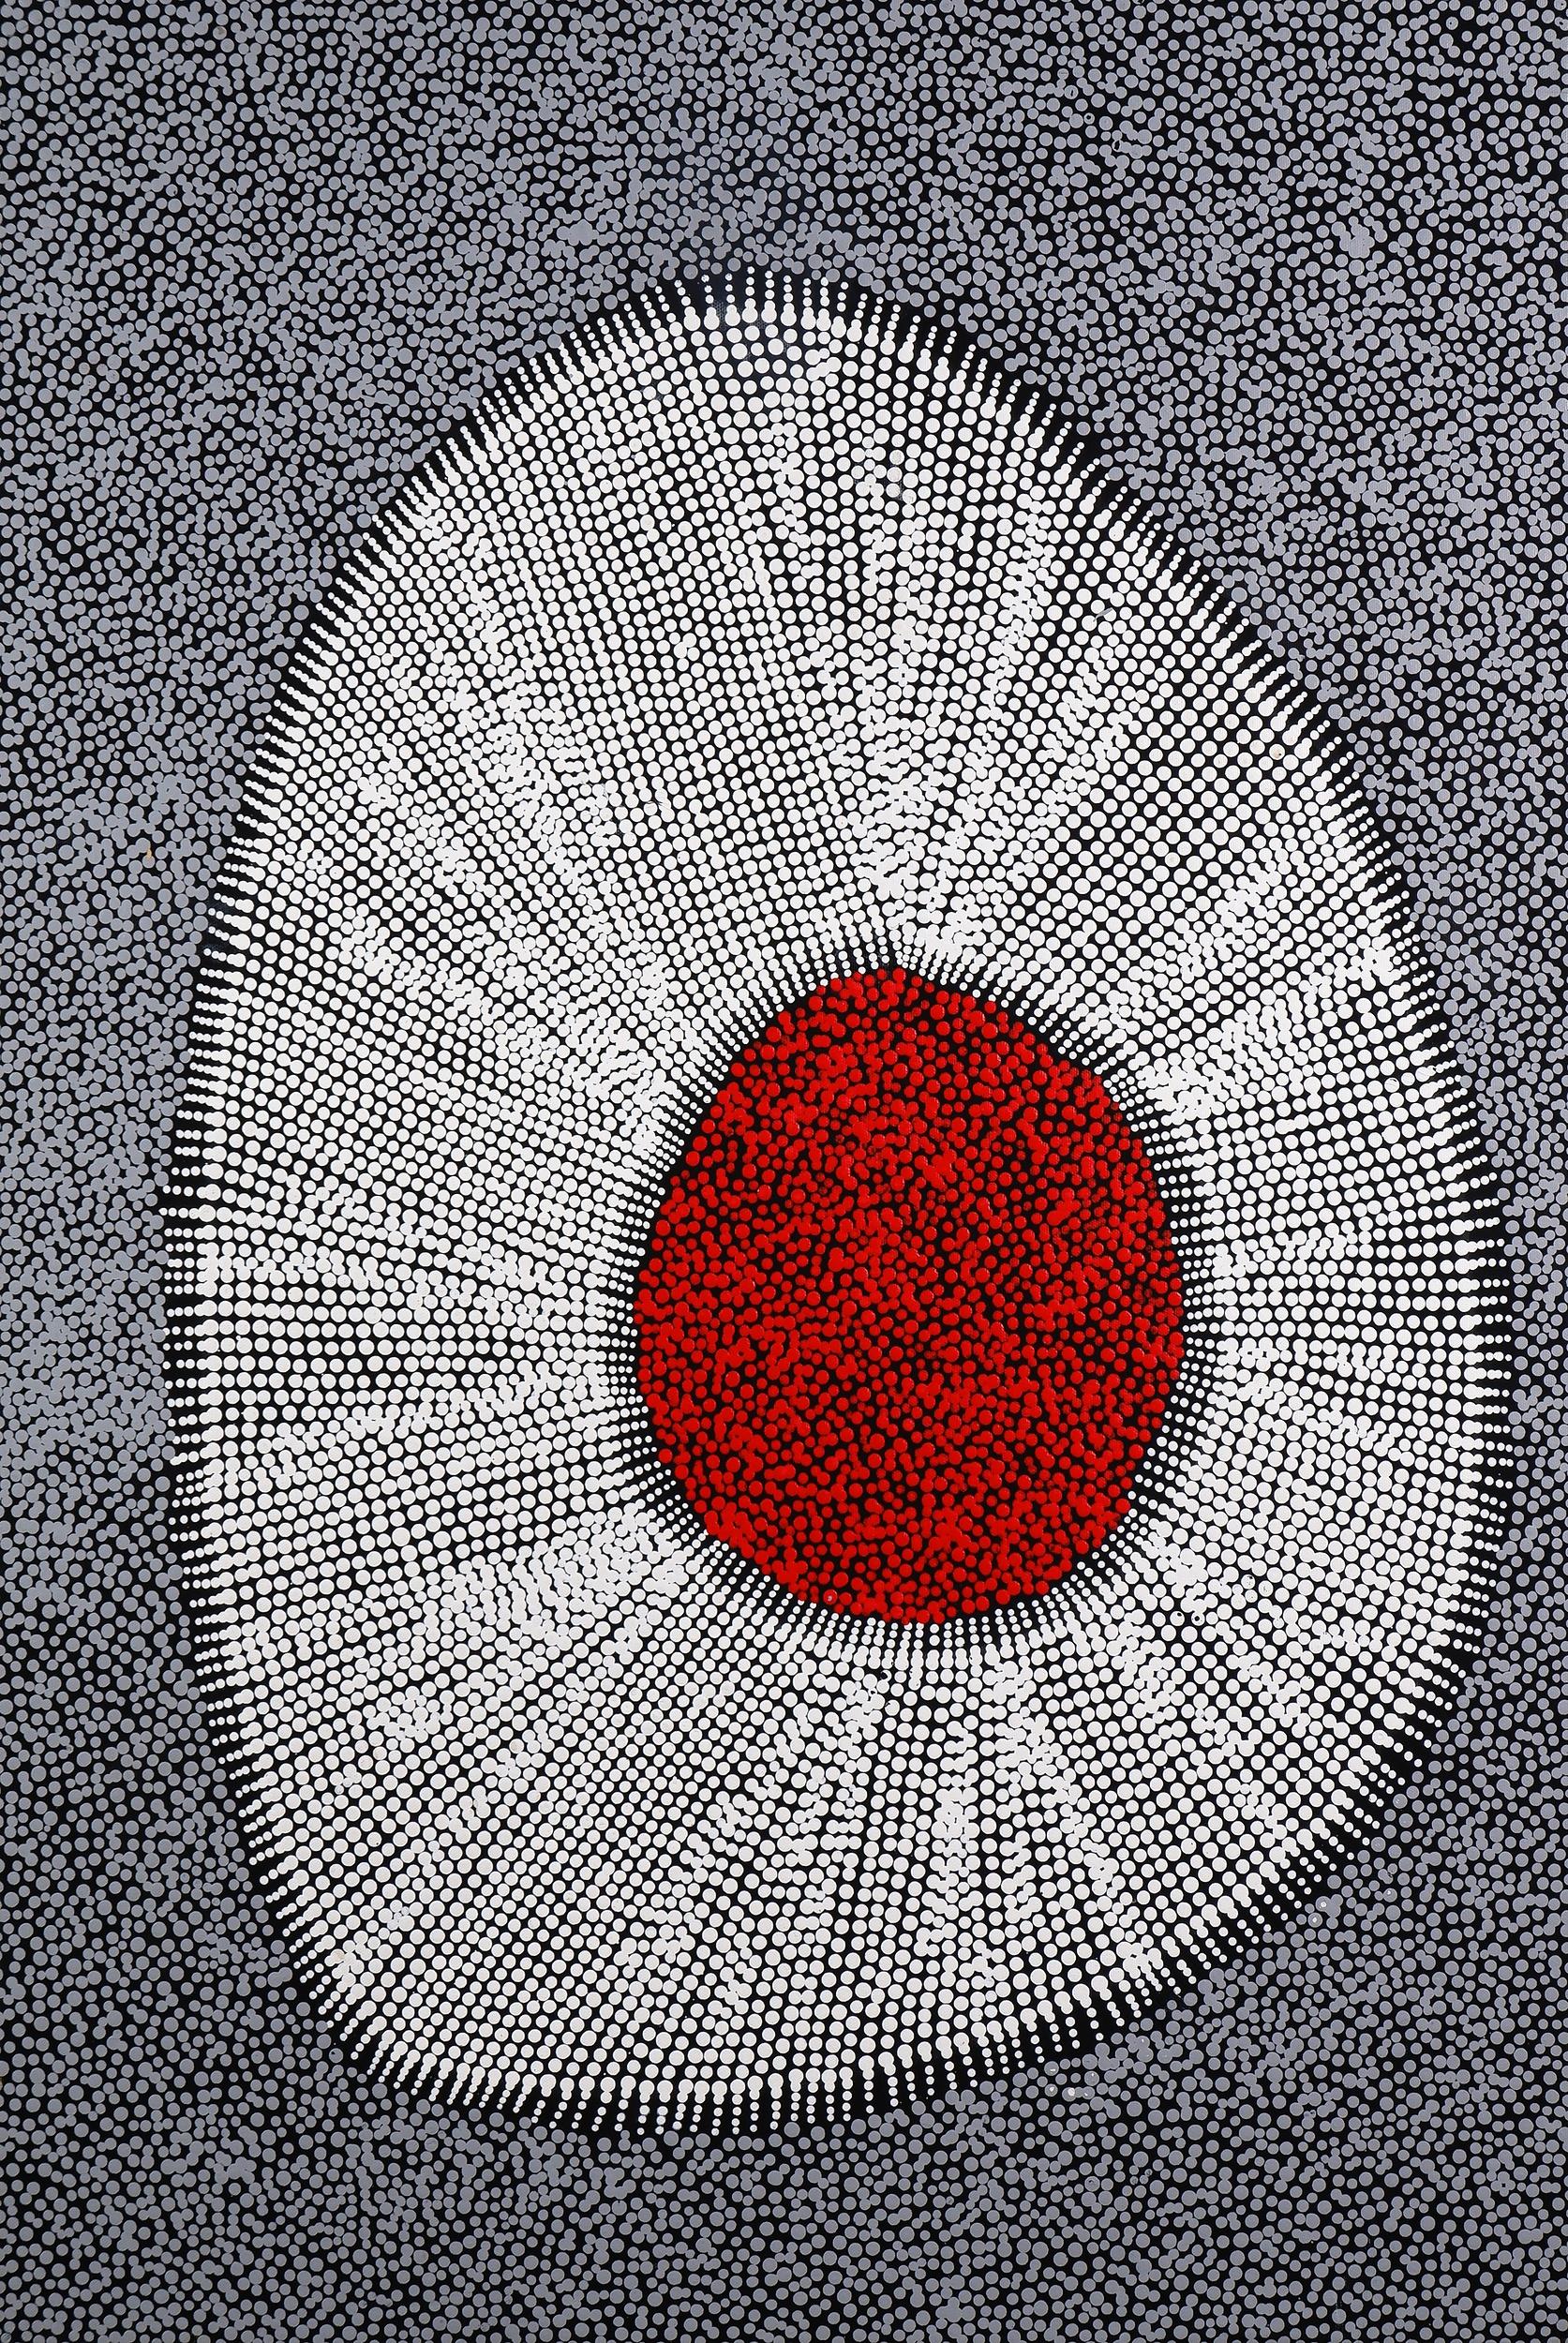 'Felicity Robertson Nampitjinpa (born 1965), Puyurru, Synthetic Polymer Paint on Canvas'